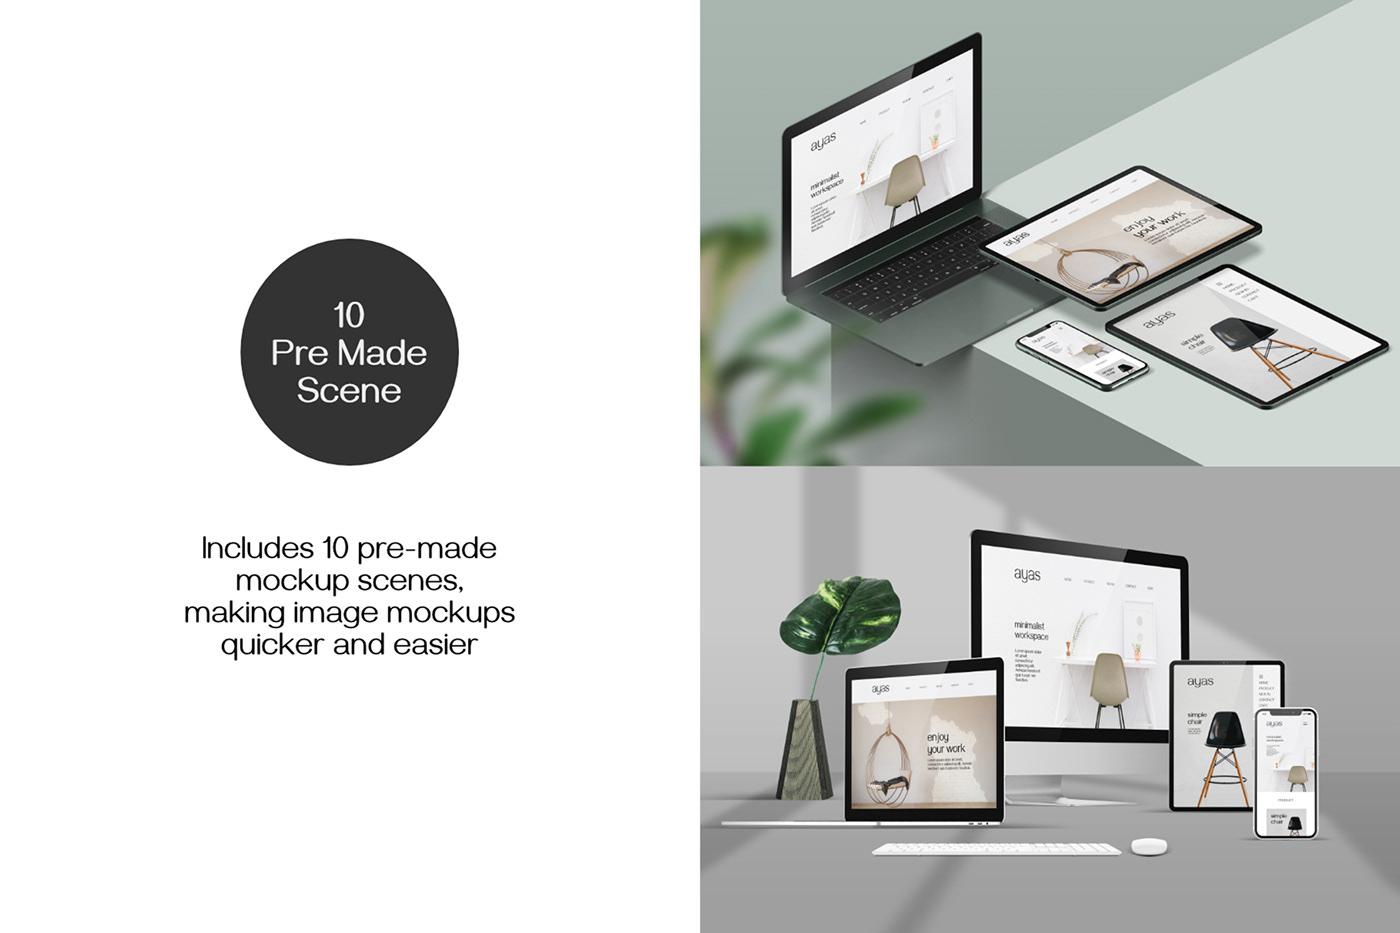 Apple devices Device Mockup iPad iphone macbook presentation mockup Responsive Screen Mockup Screen mockup UI UX design web showcase